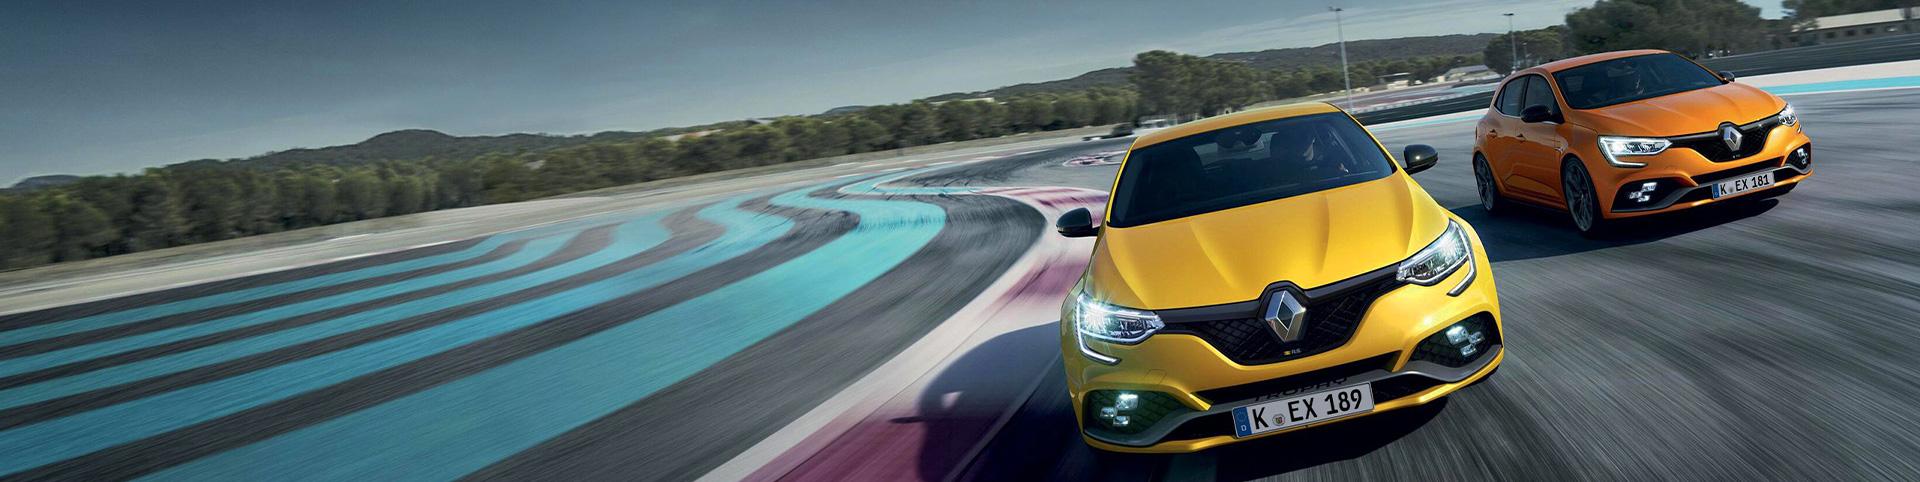 Renault Megane R.S. Autozentren P&A - Preckel